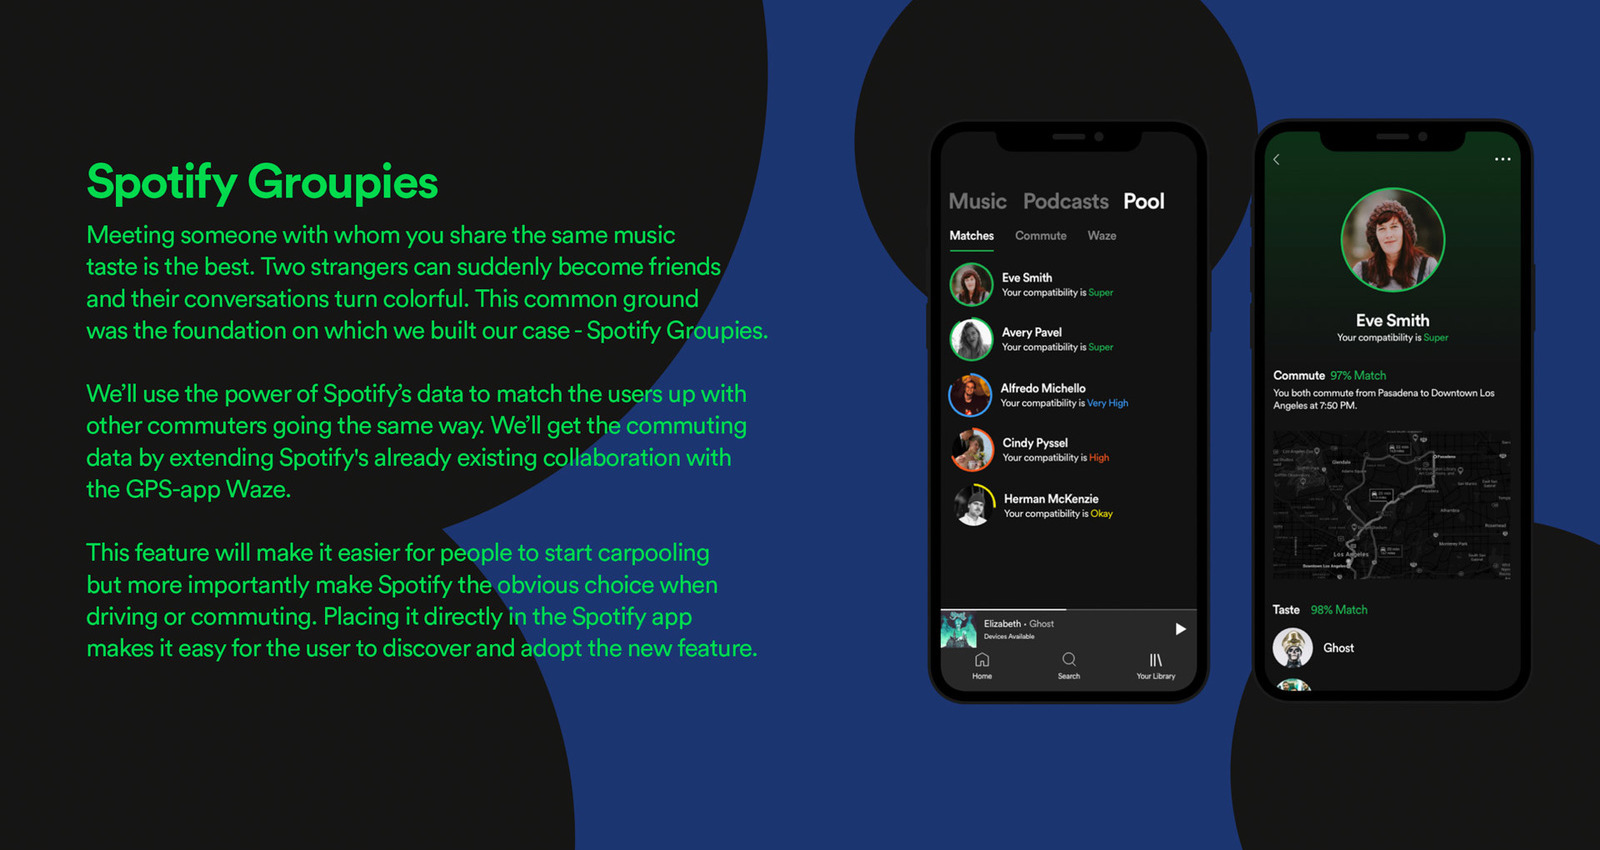 Spotify Groupies